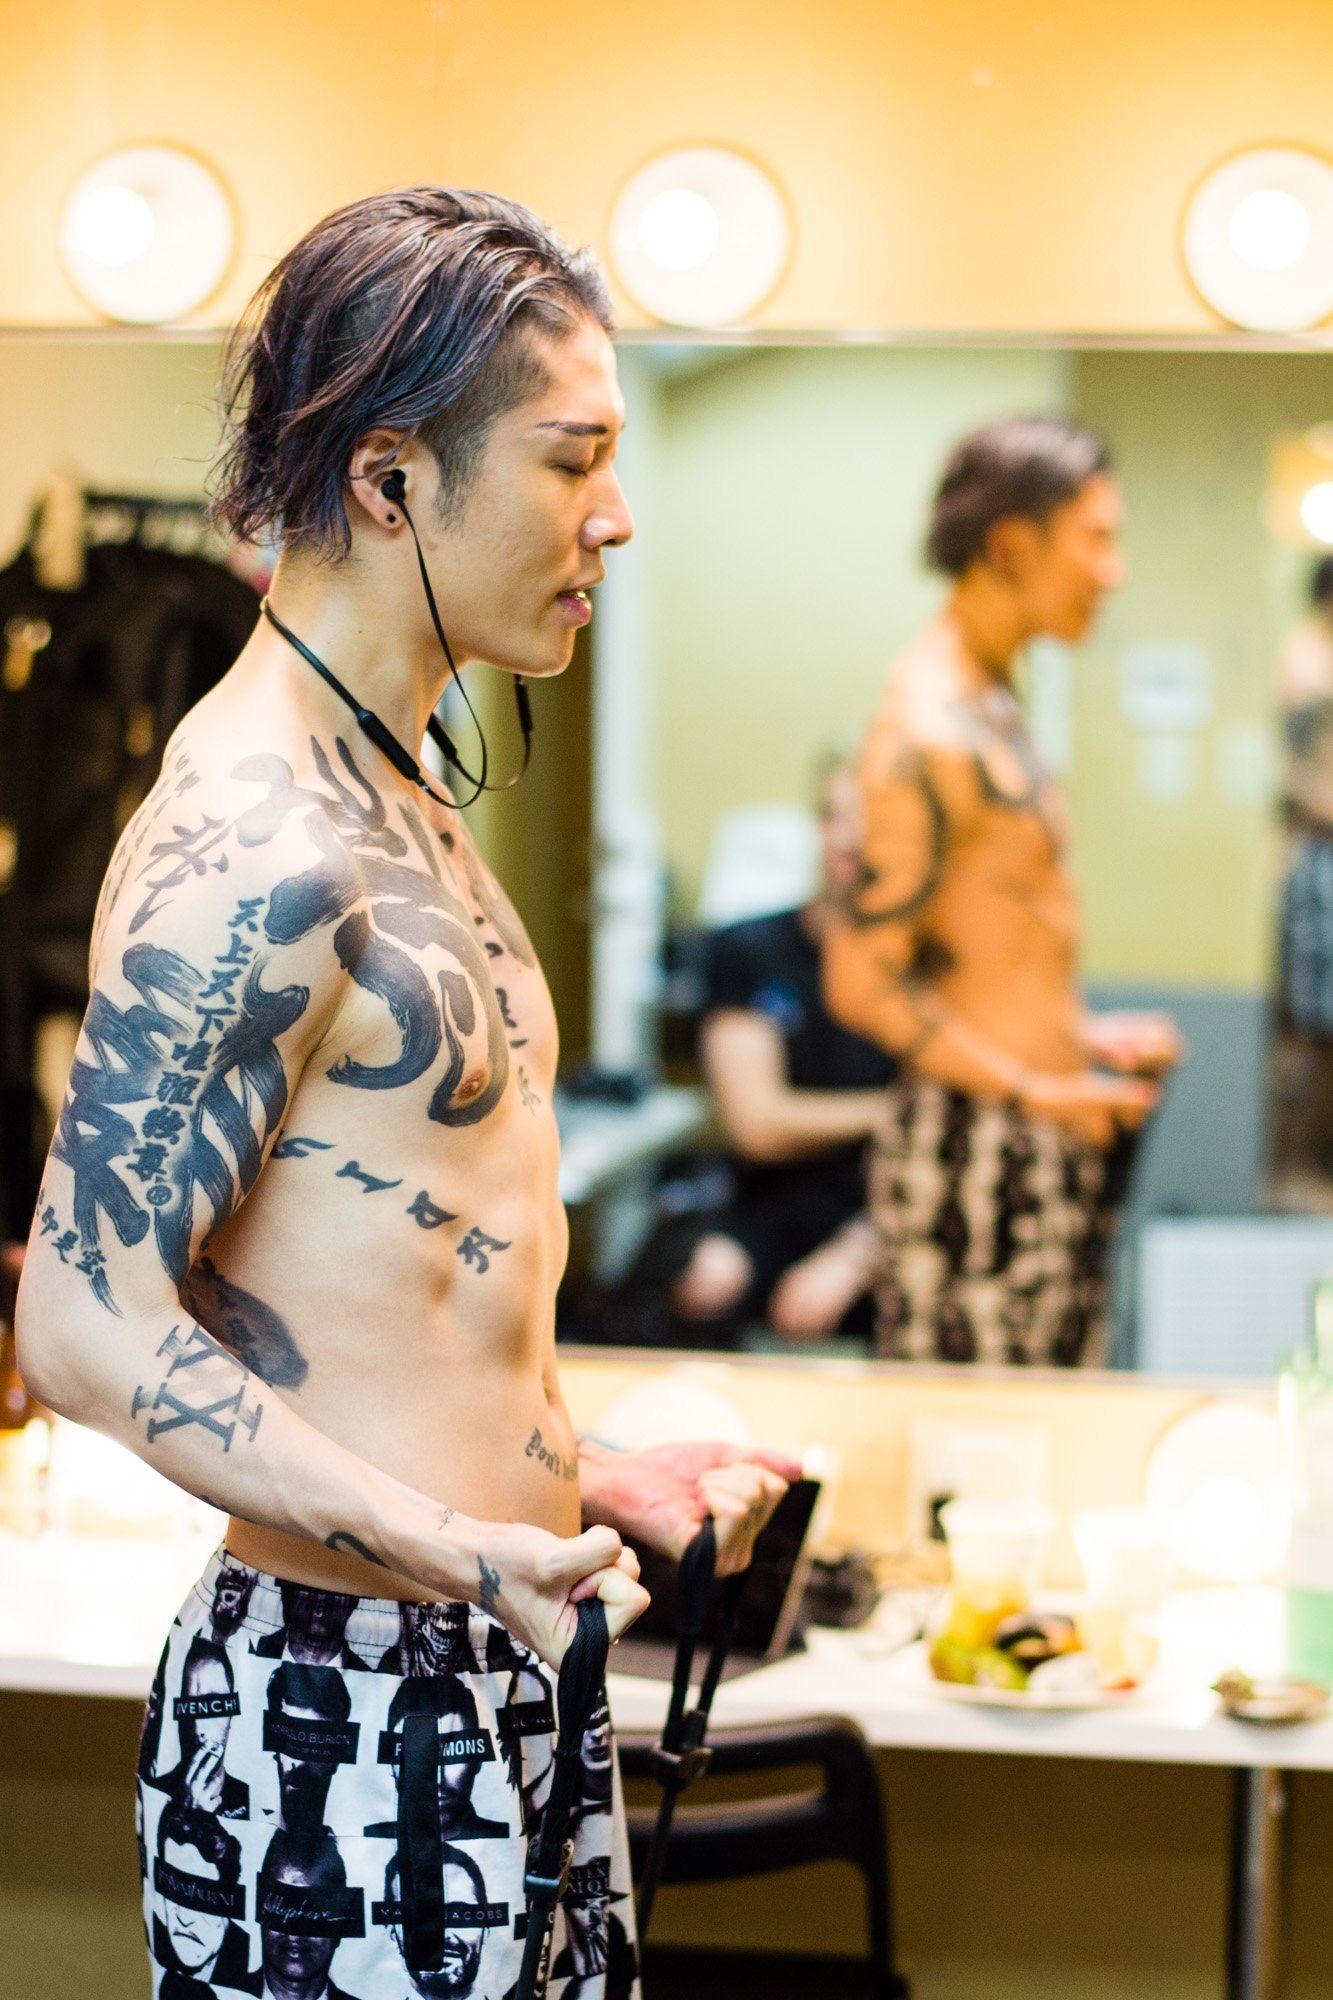 20 Ishihara Miyavi Tattoos Pictures And Ideas On Meta Networks